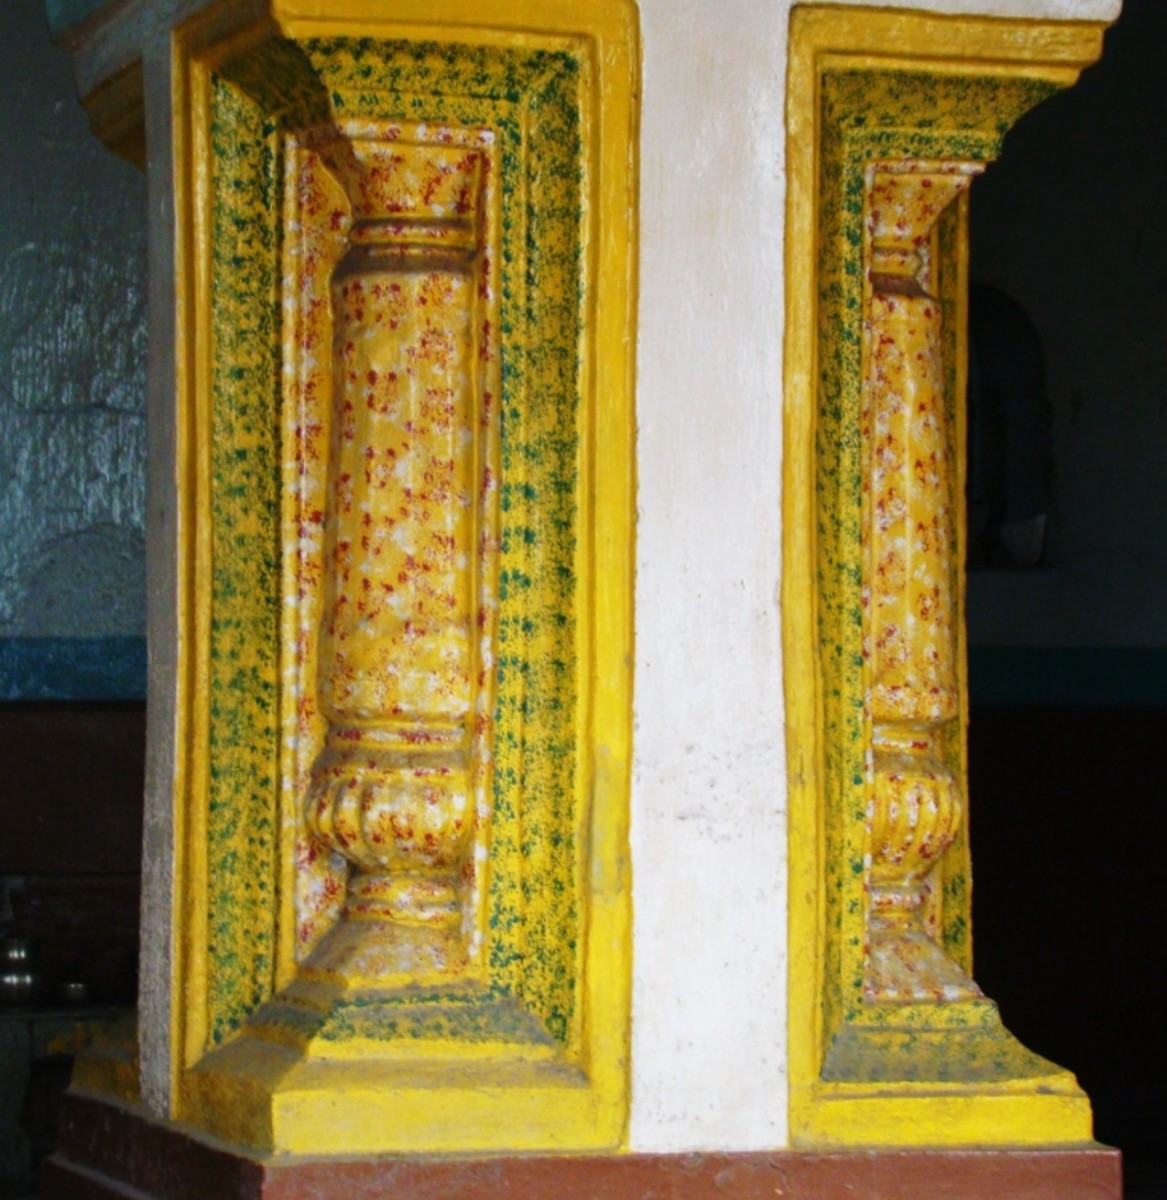 Decorated pillar, Mohanta Asthal temple, Ukhra